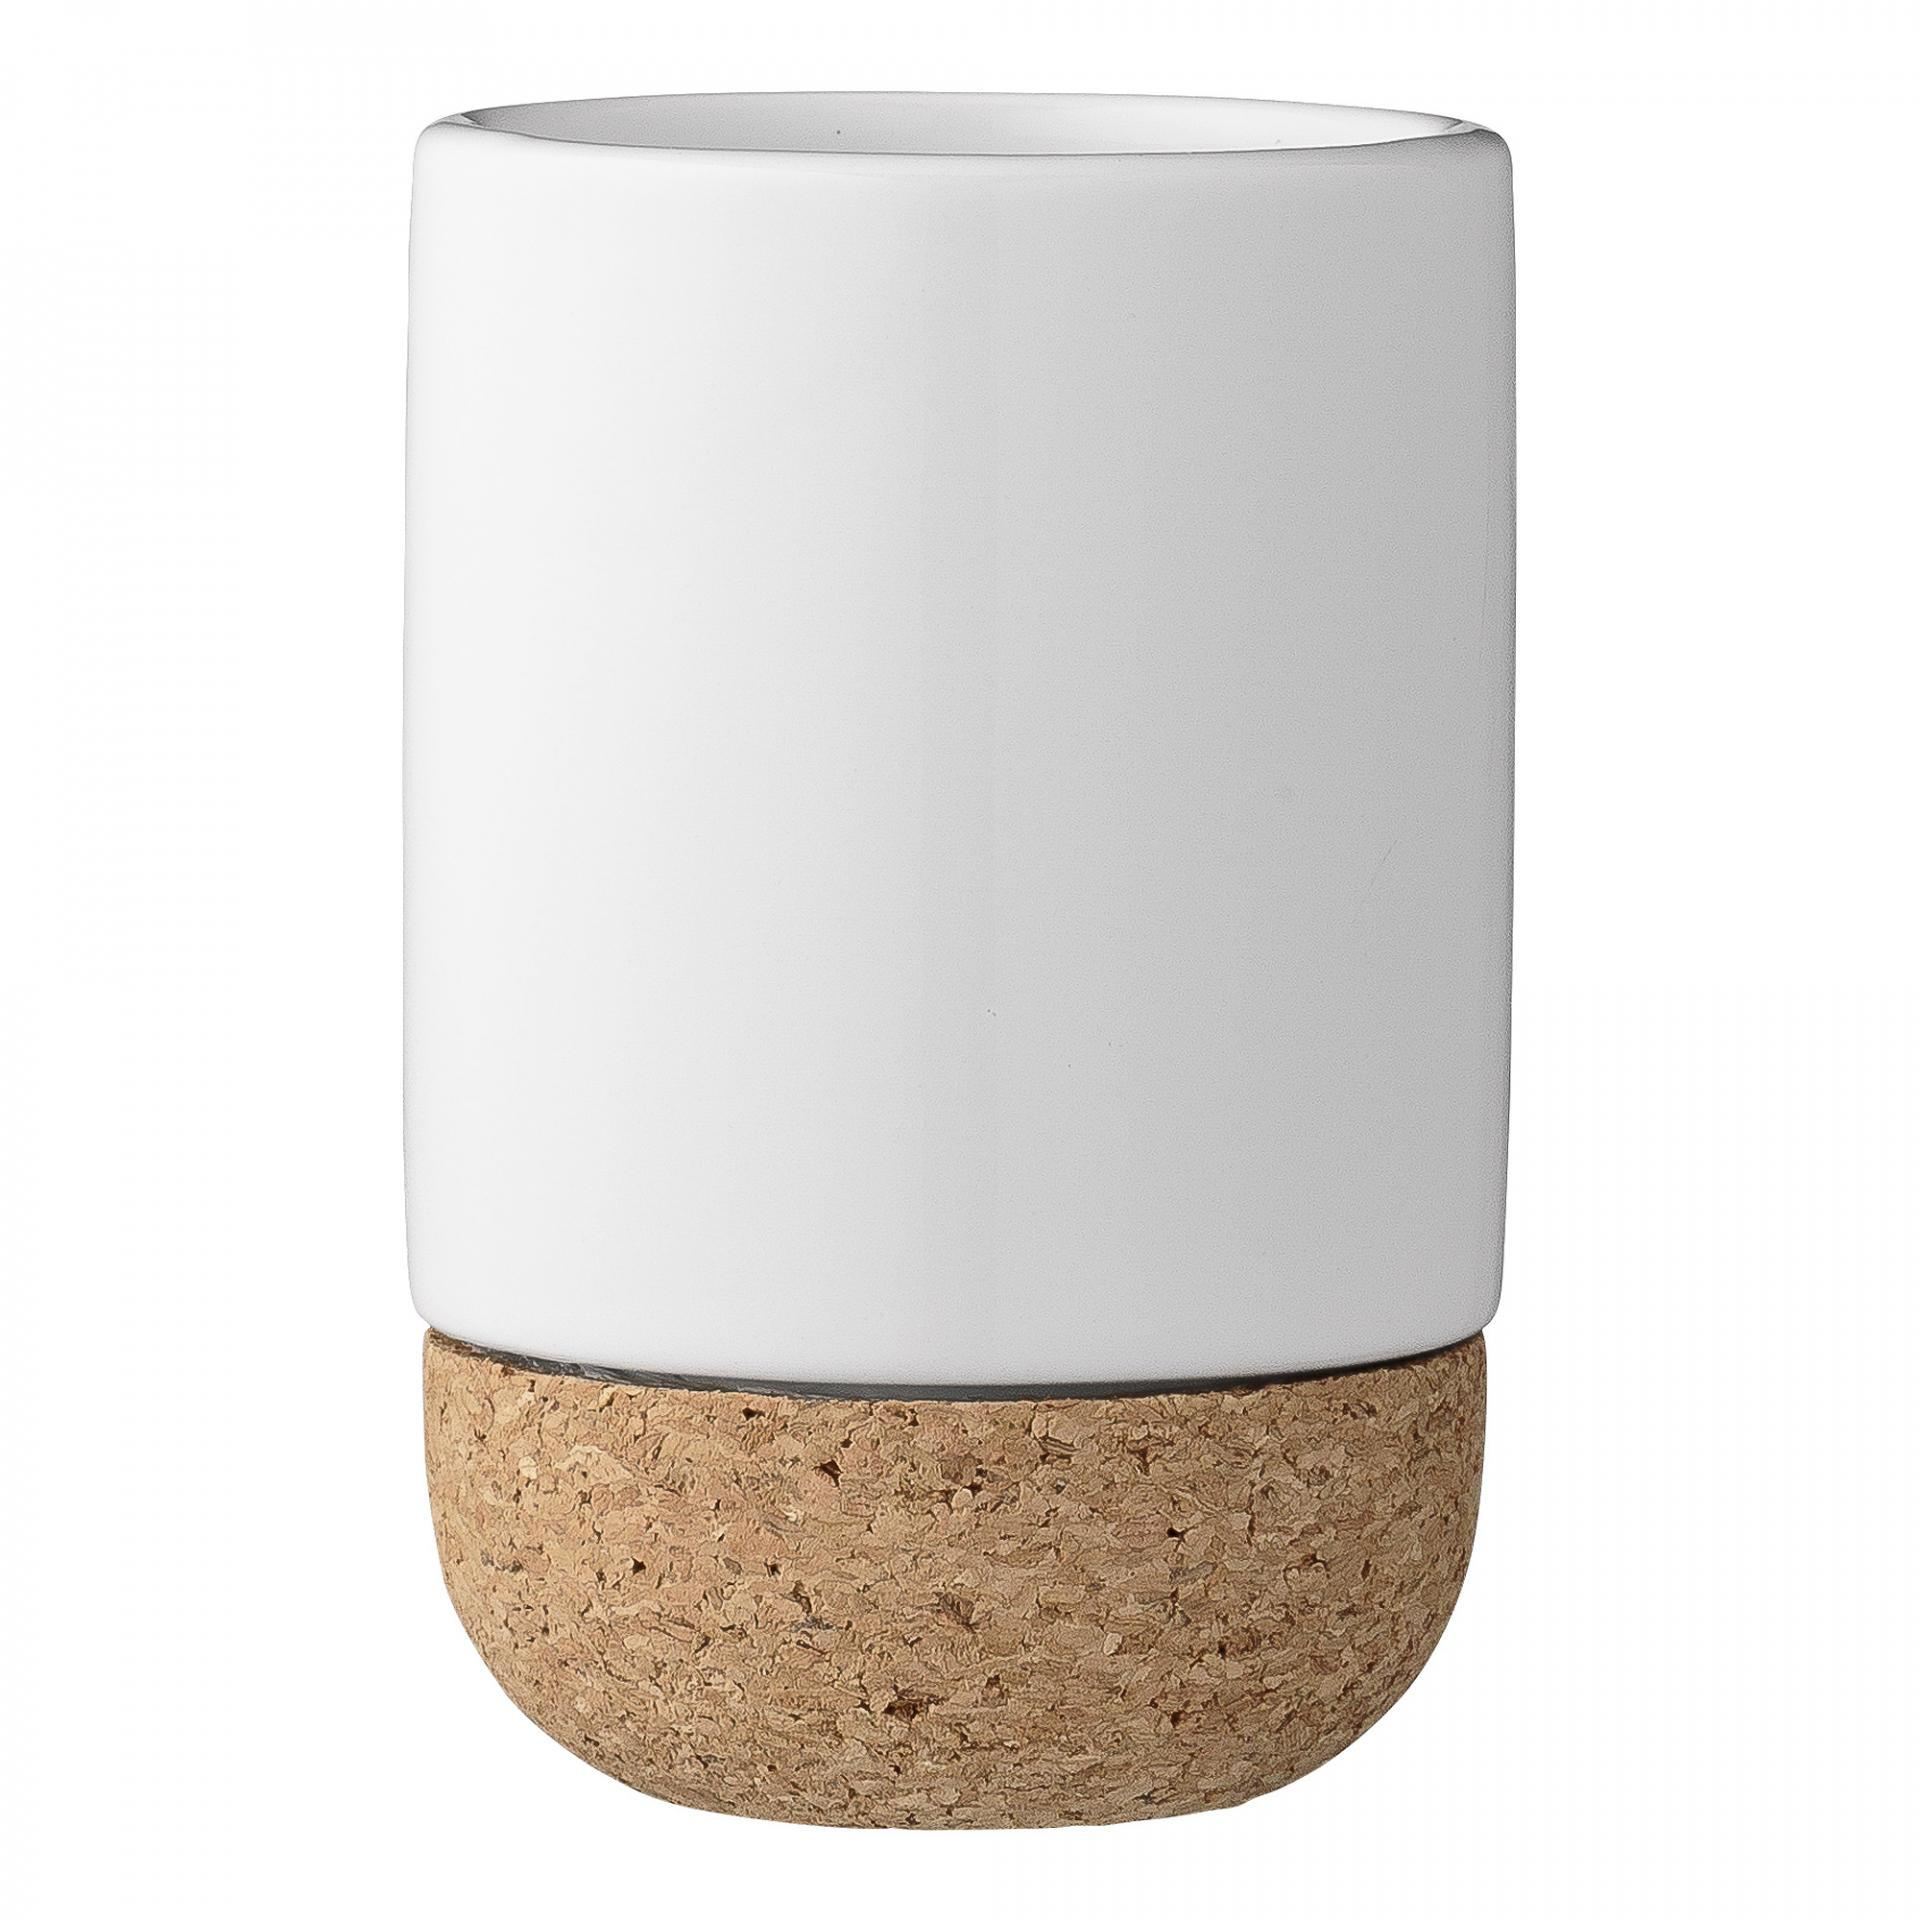 Bloomingville Keramický kalíšek do koupelny Cork Base, bílá barva, hnědá barva, keramika